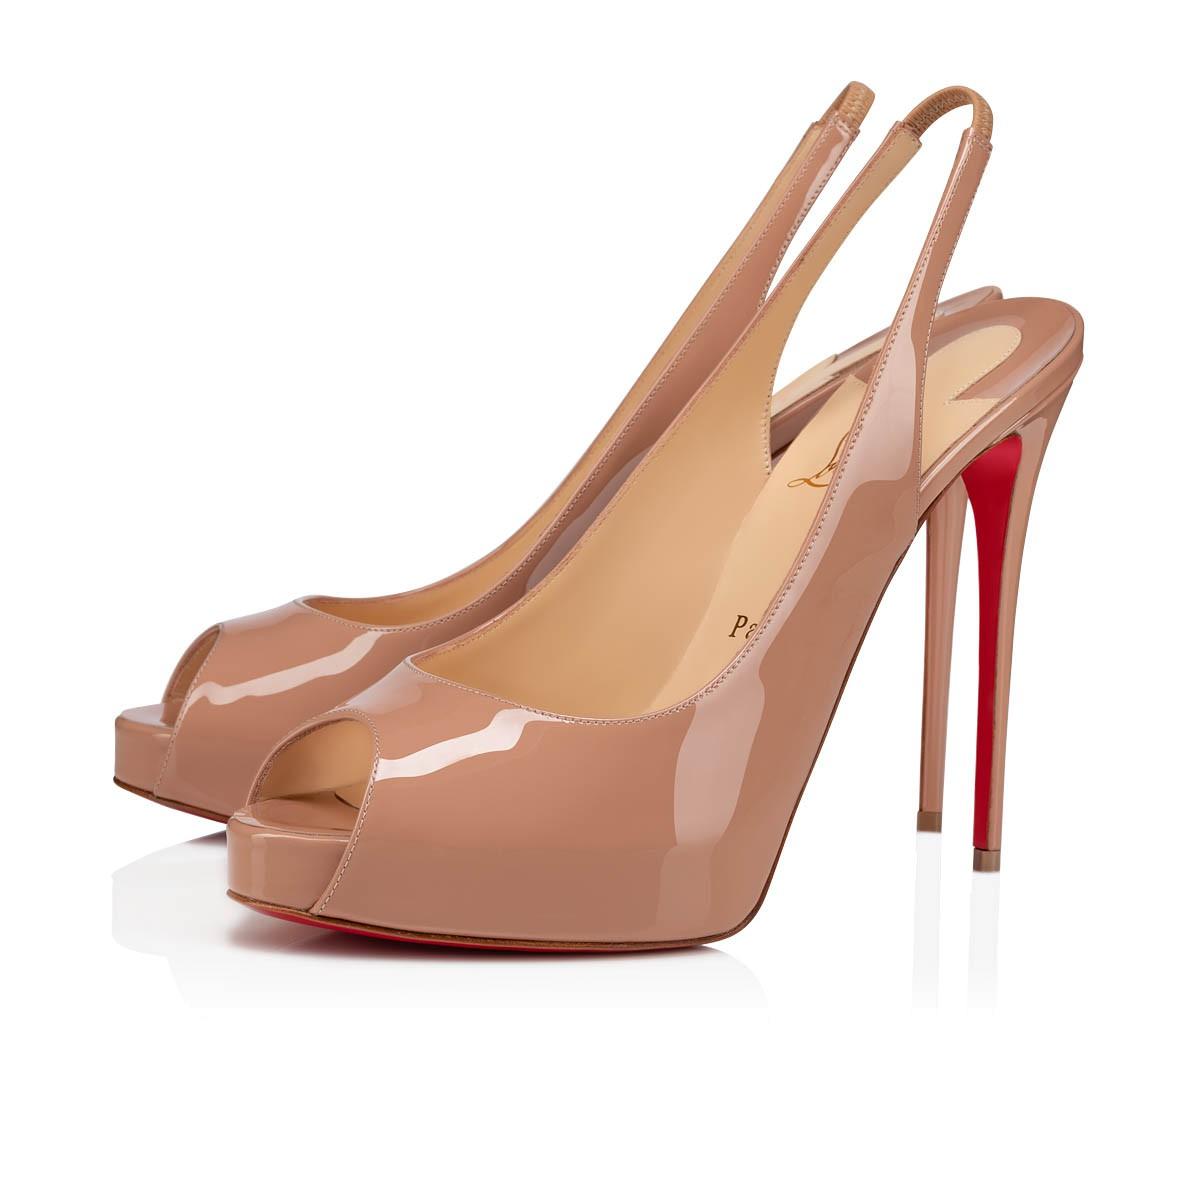 chaussure louboutin femme beige